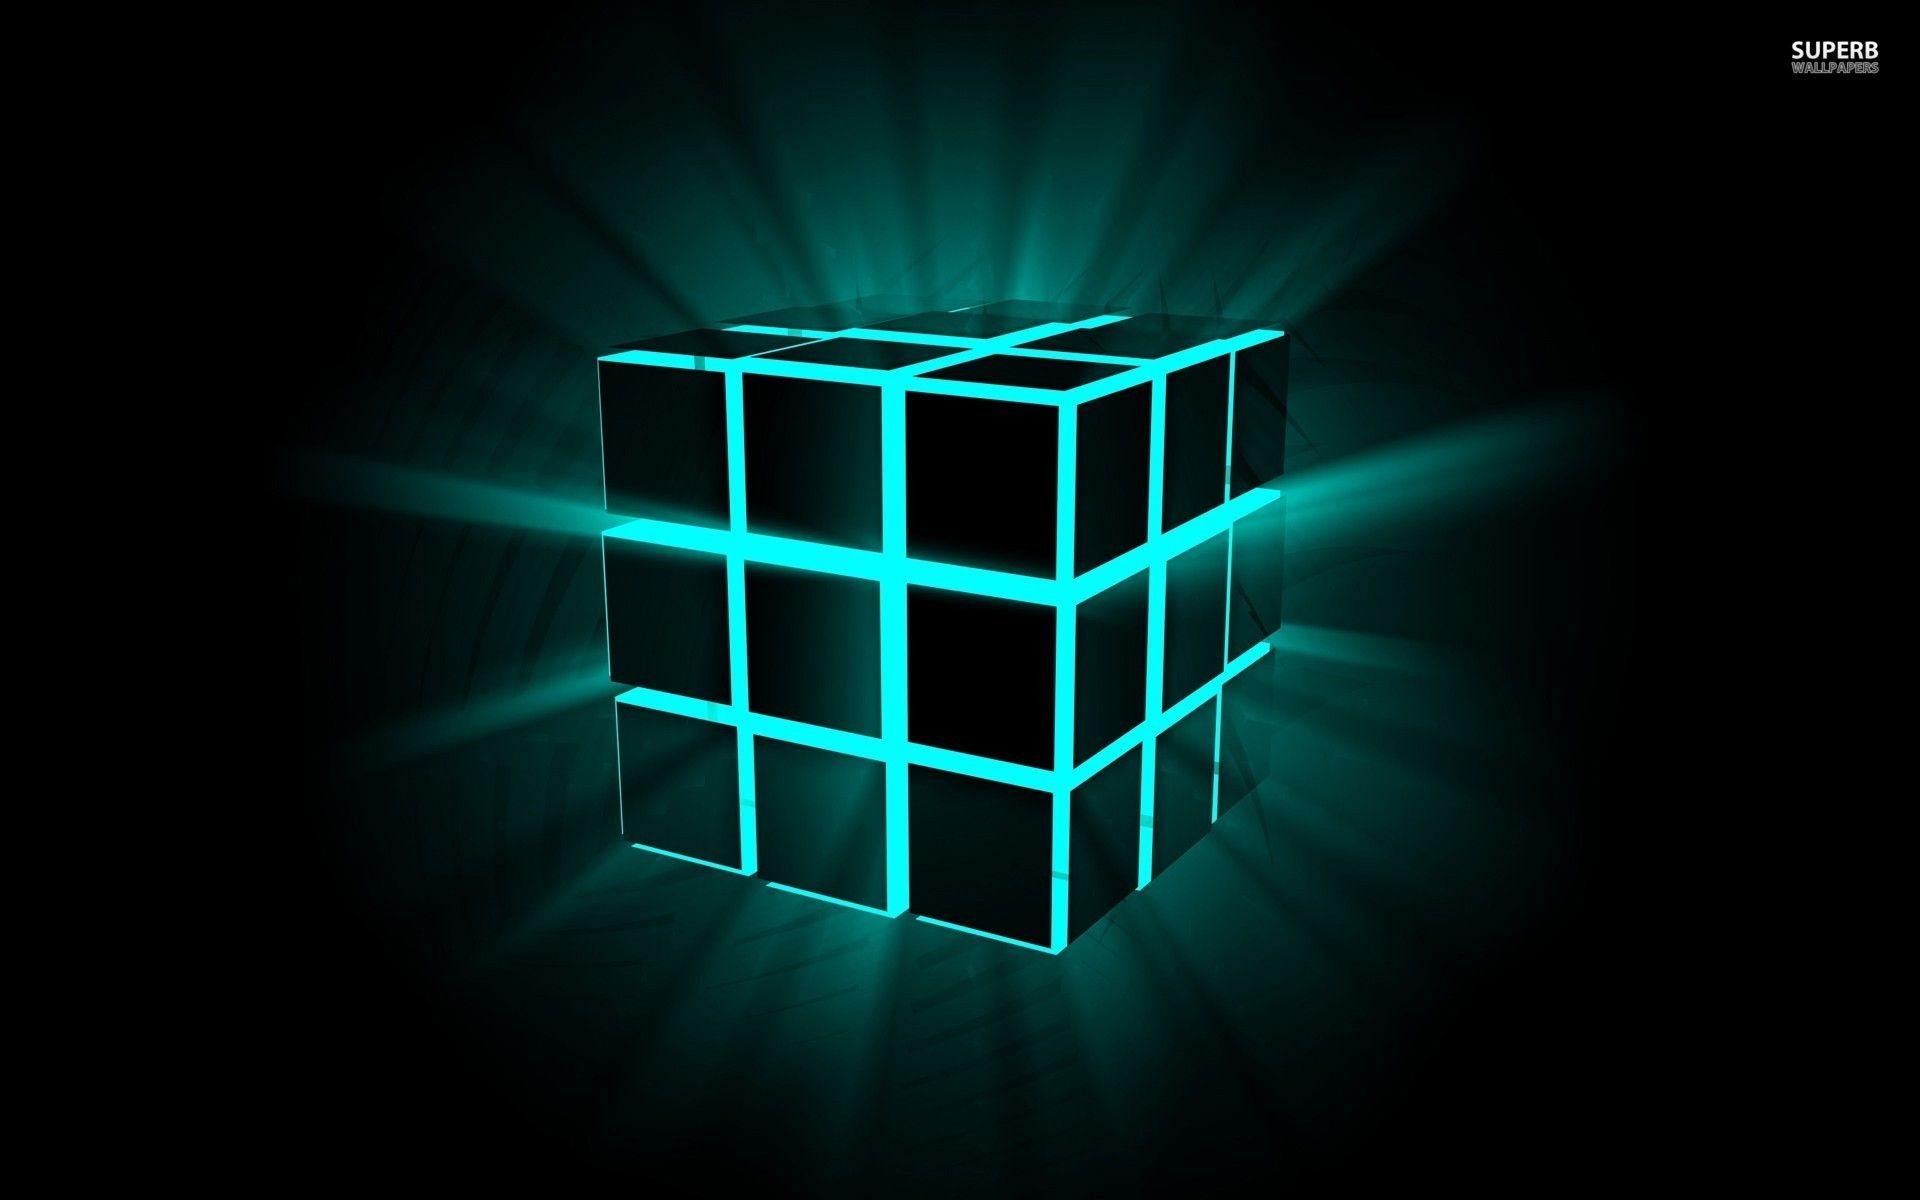 Neon Cube Wallpaper